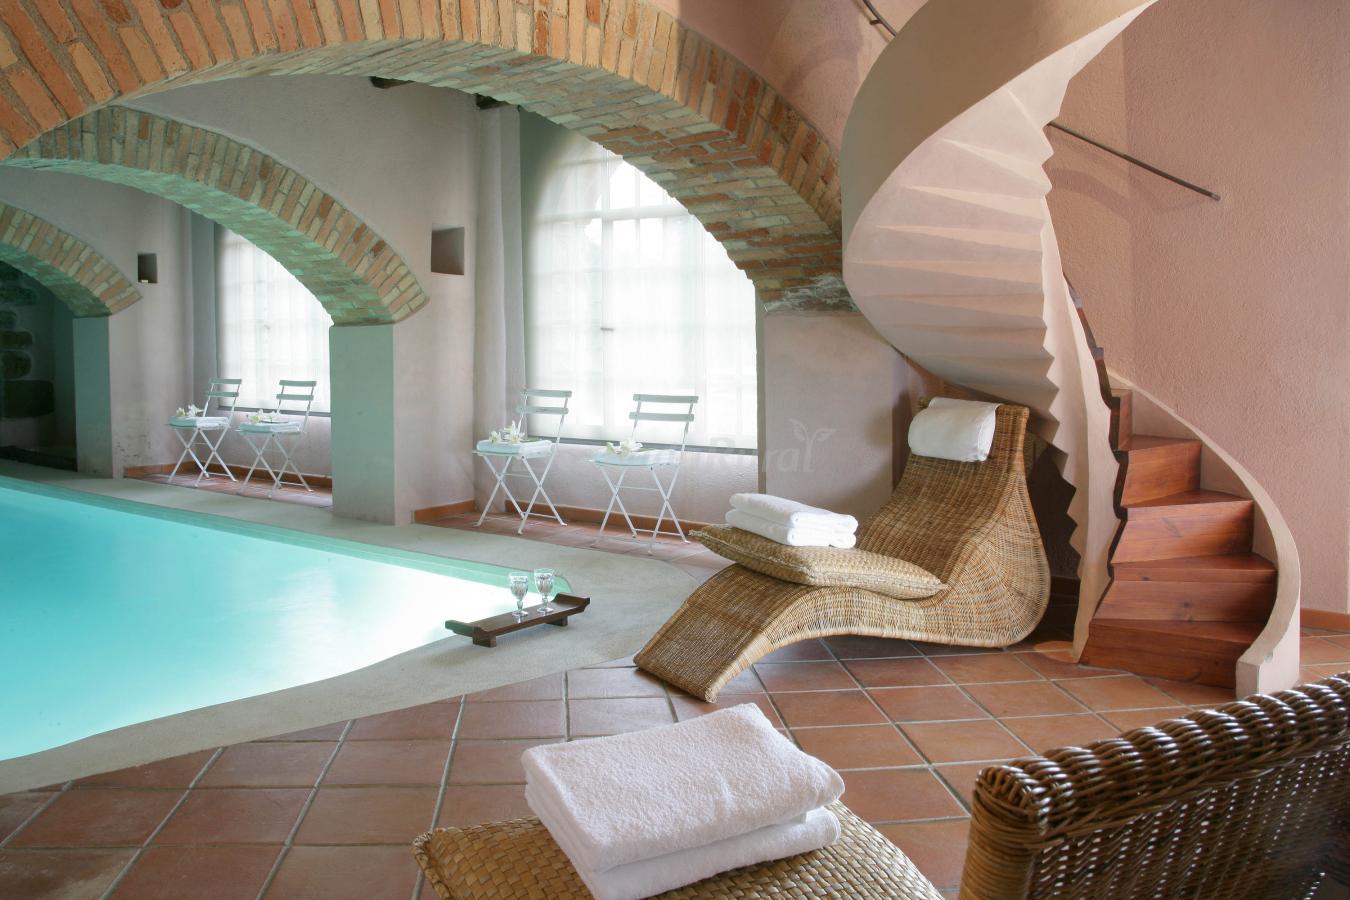 Fotos de el munt casa rural en castellter ol barcelona for Casas con piscina barcelona alquiler